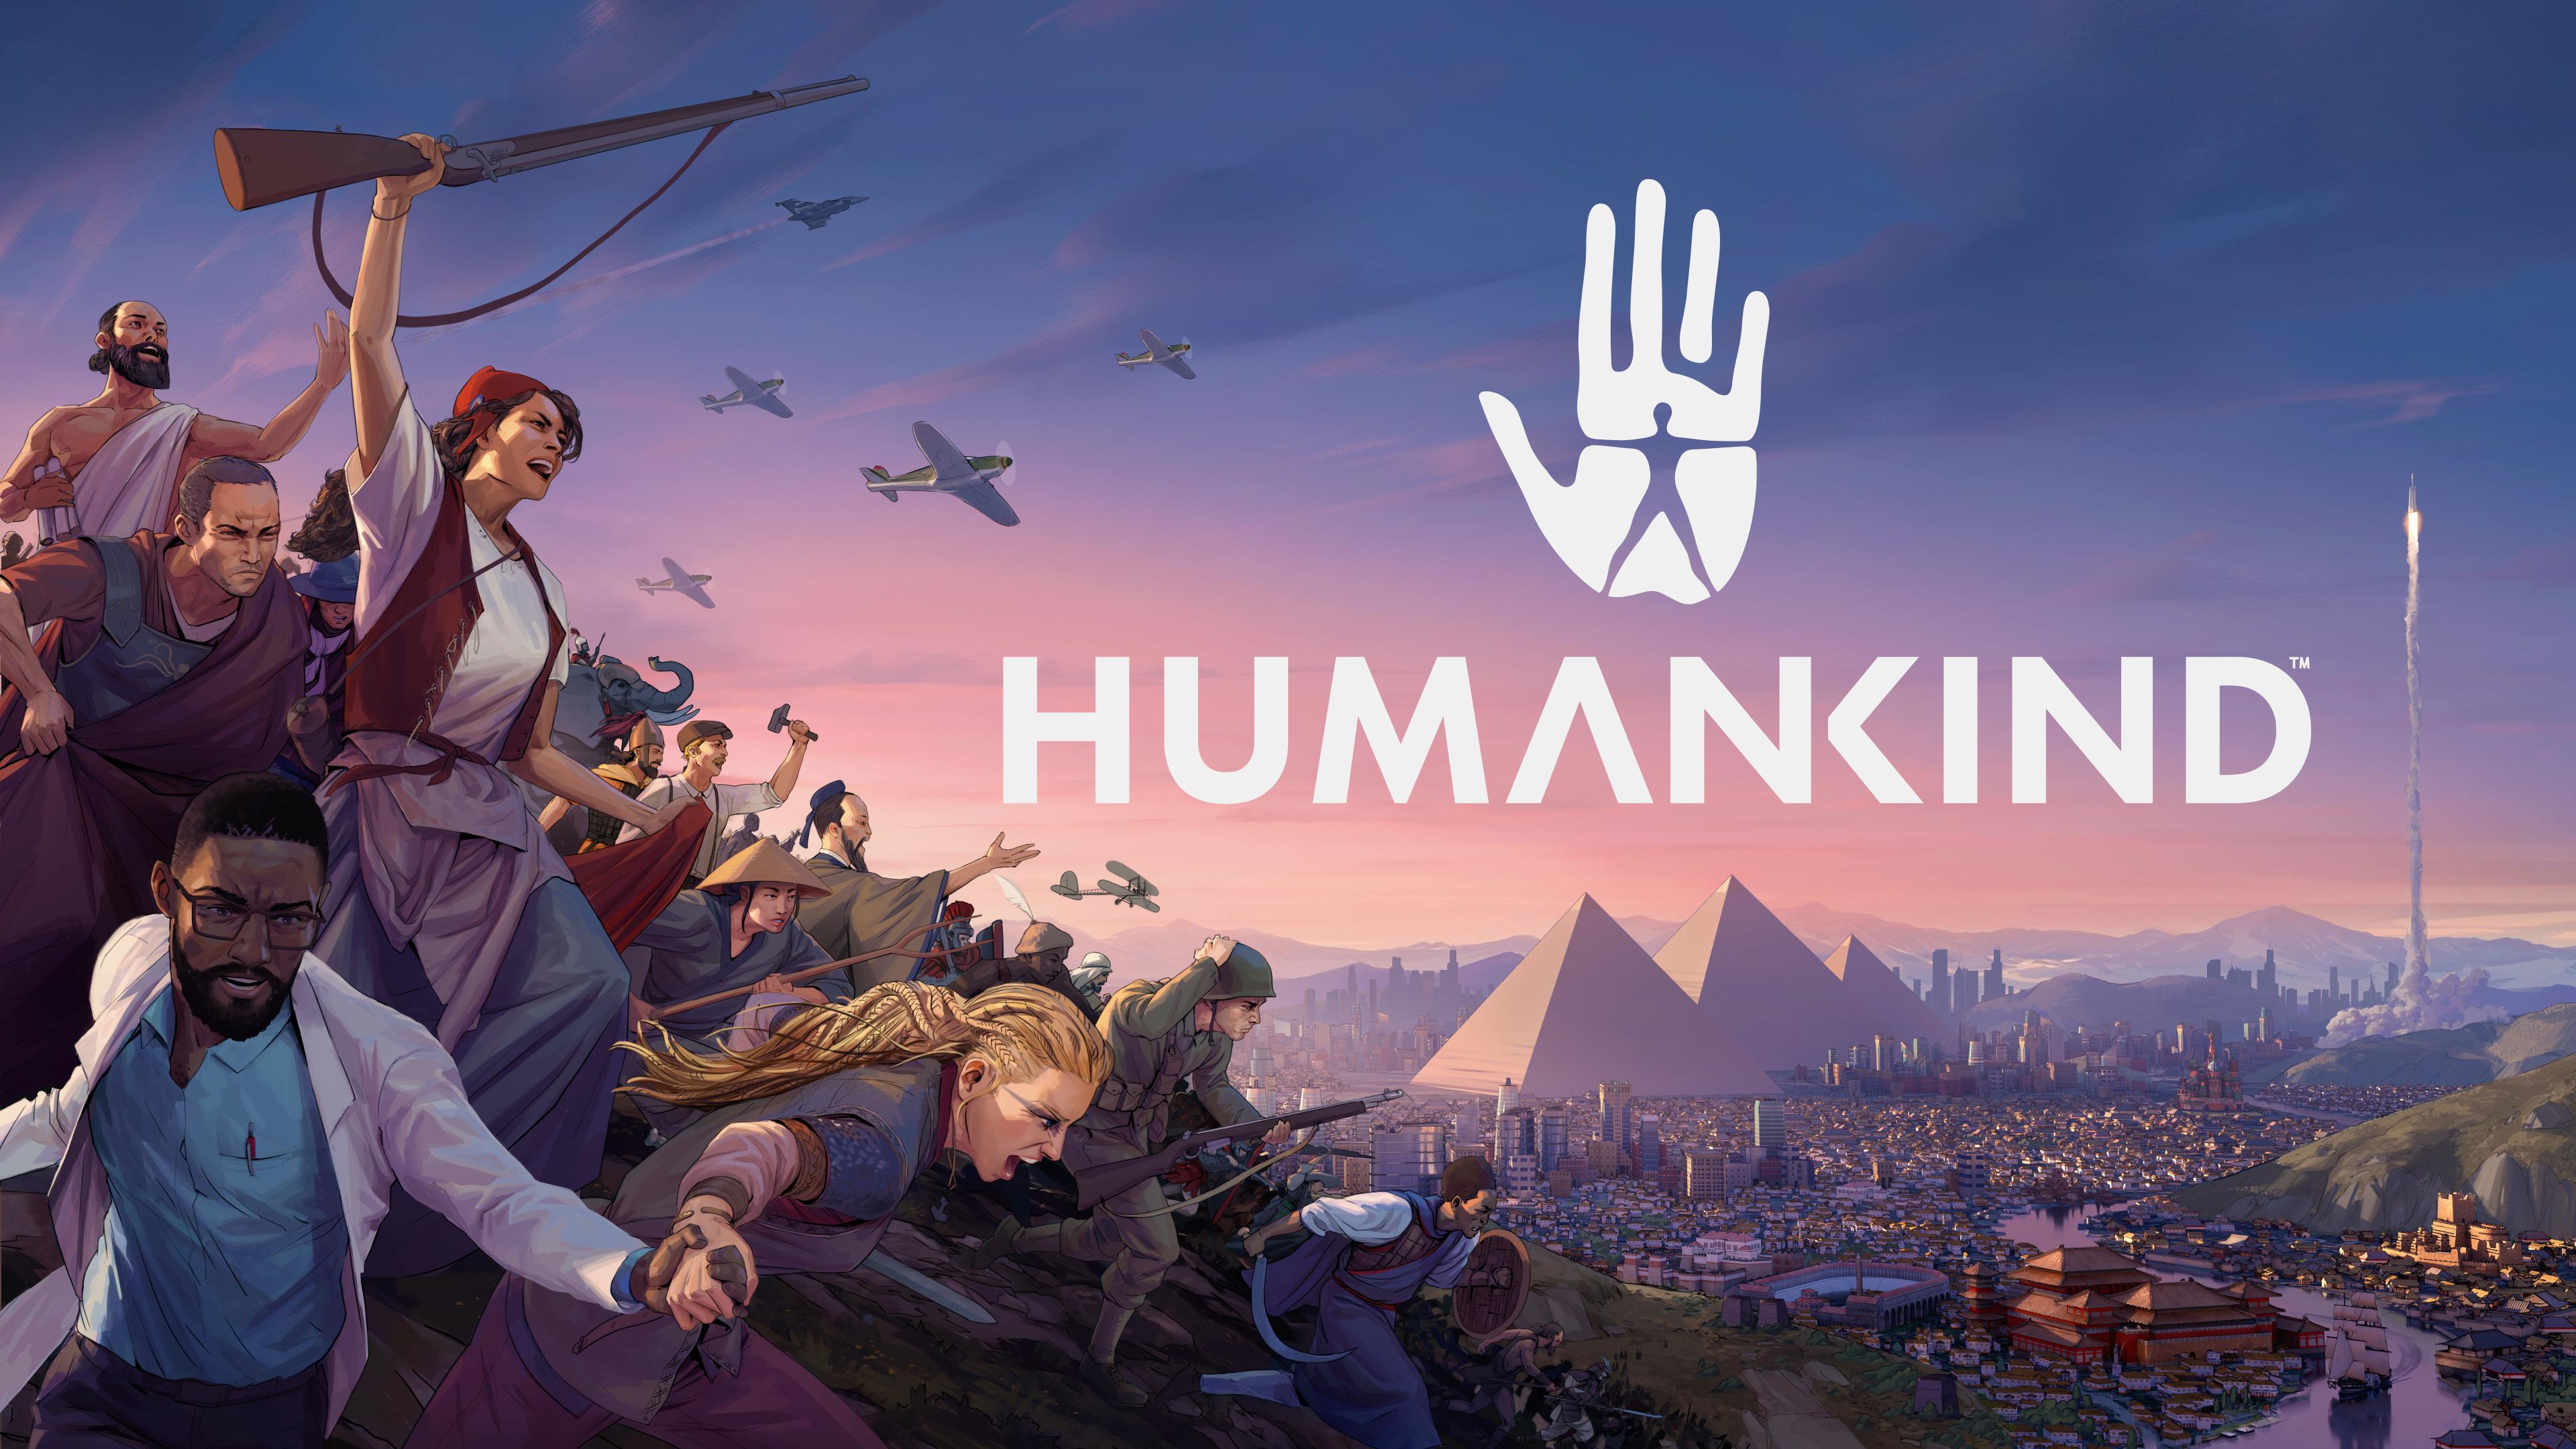 https://images.wallpapersden.com/image/download/humankind-game-4k-8k_68409_3840x2160.jpg